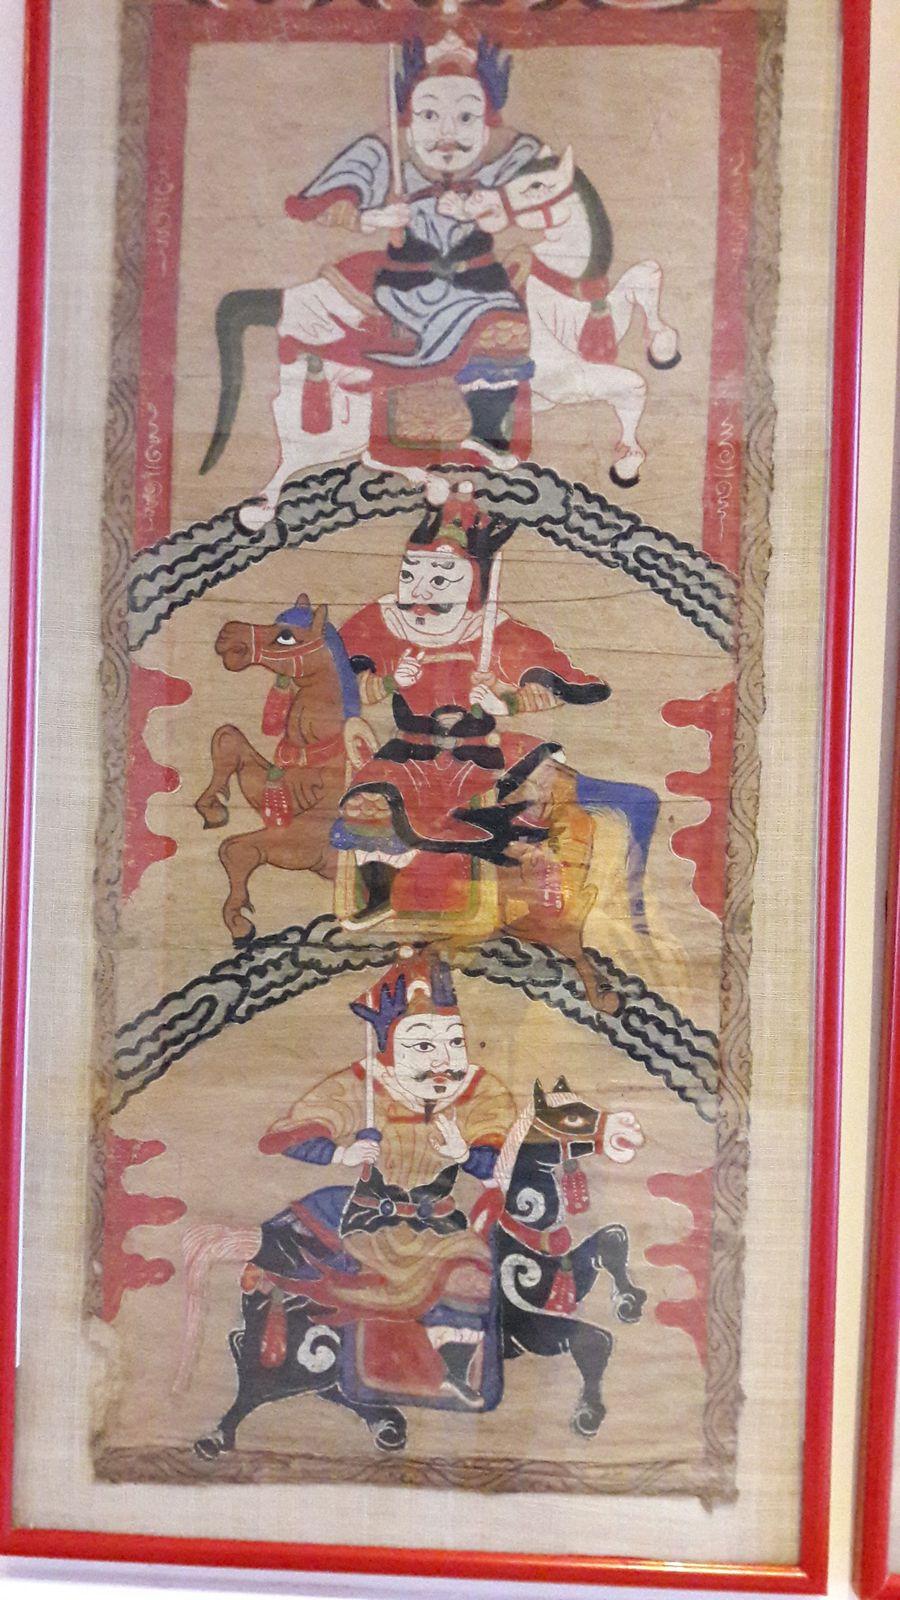 Les Yao, minorité taoïste